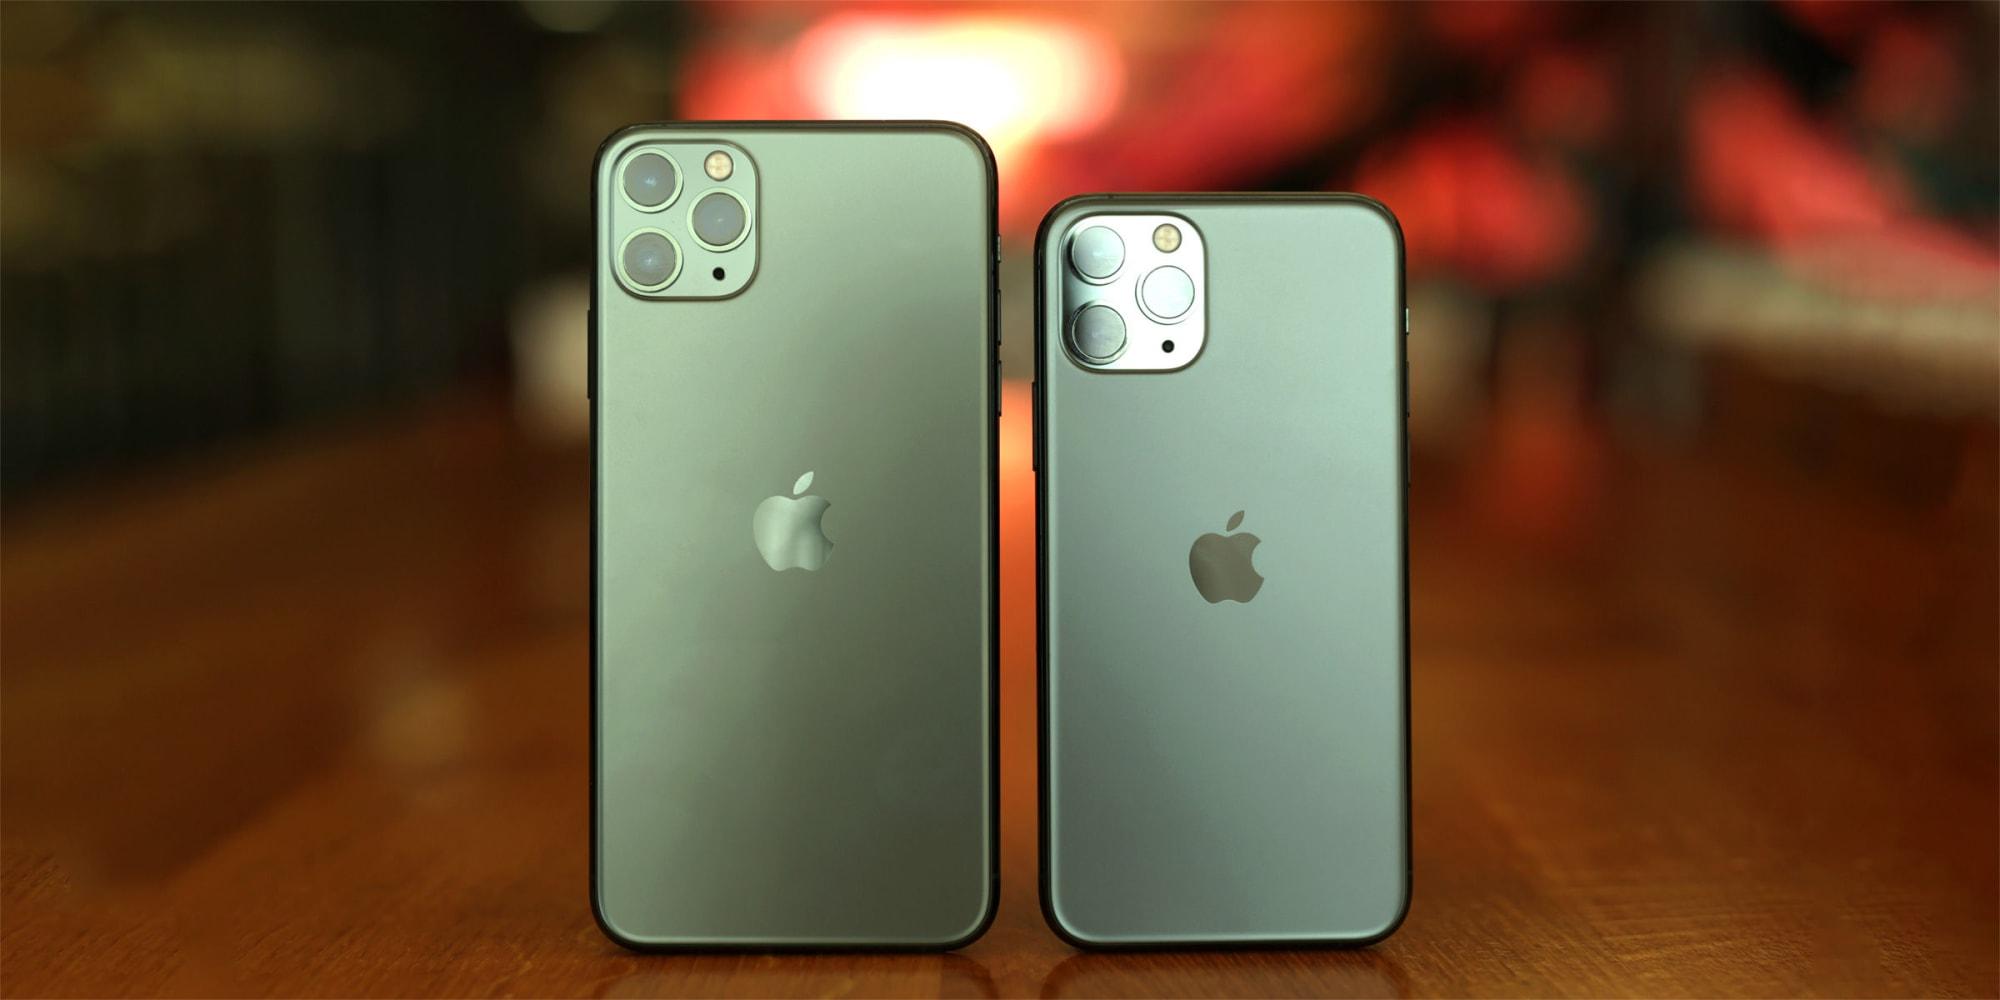 iphone 11 pro max レビュー